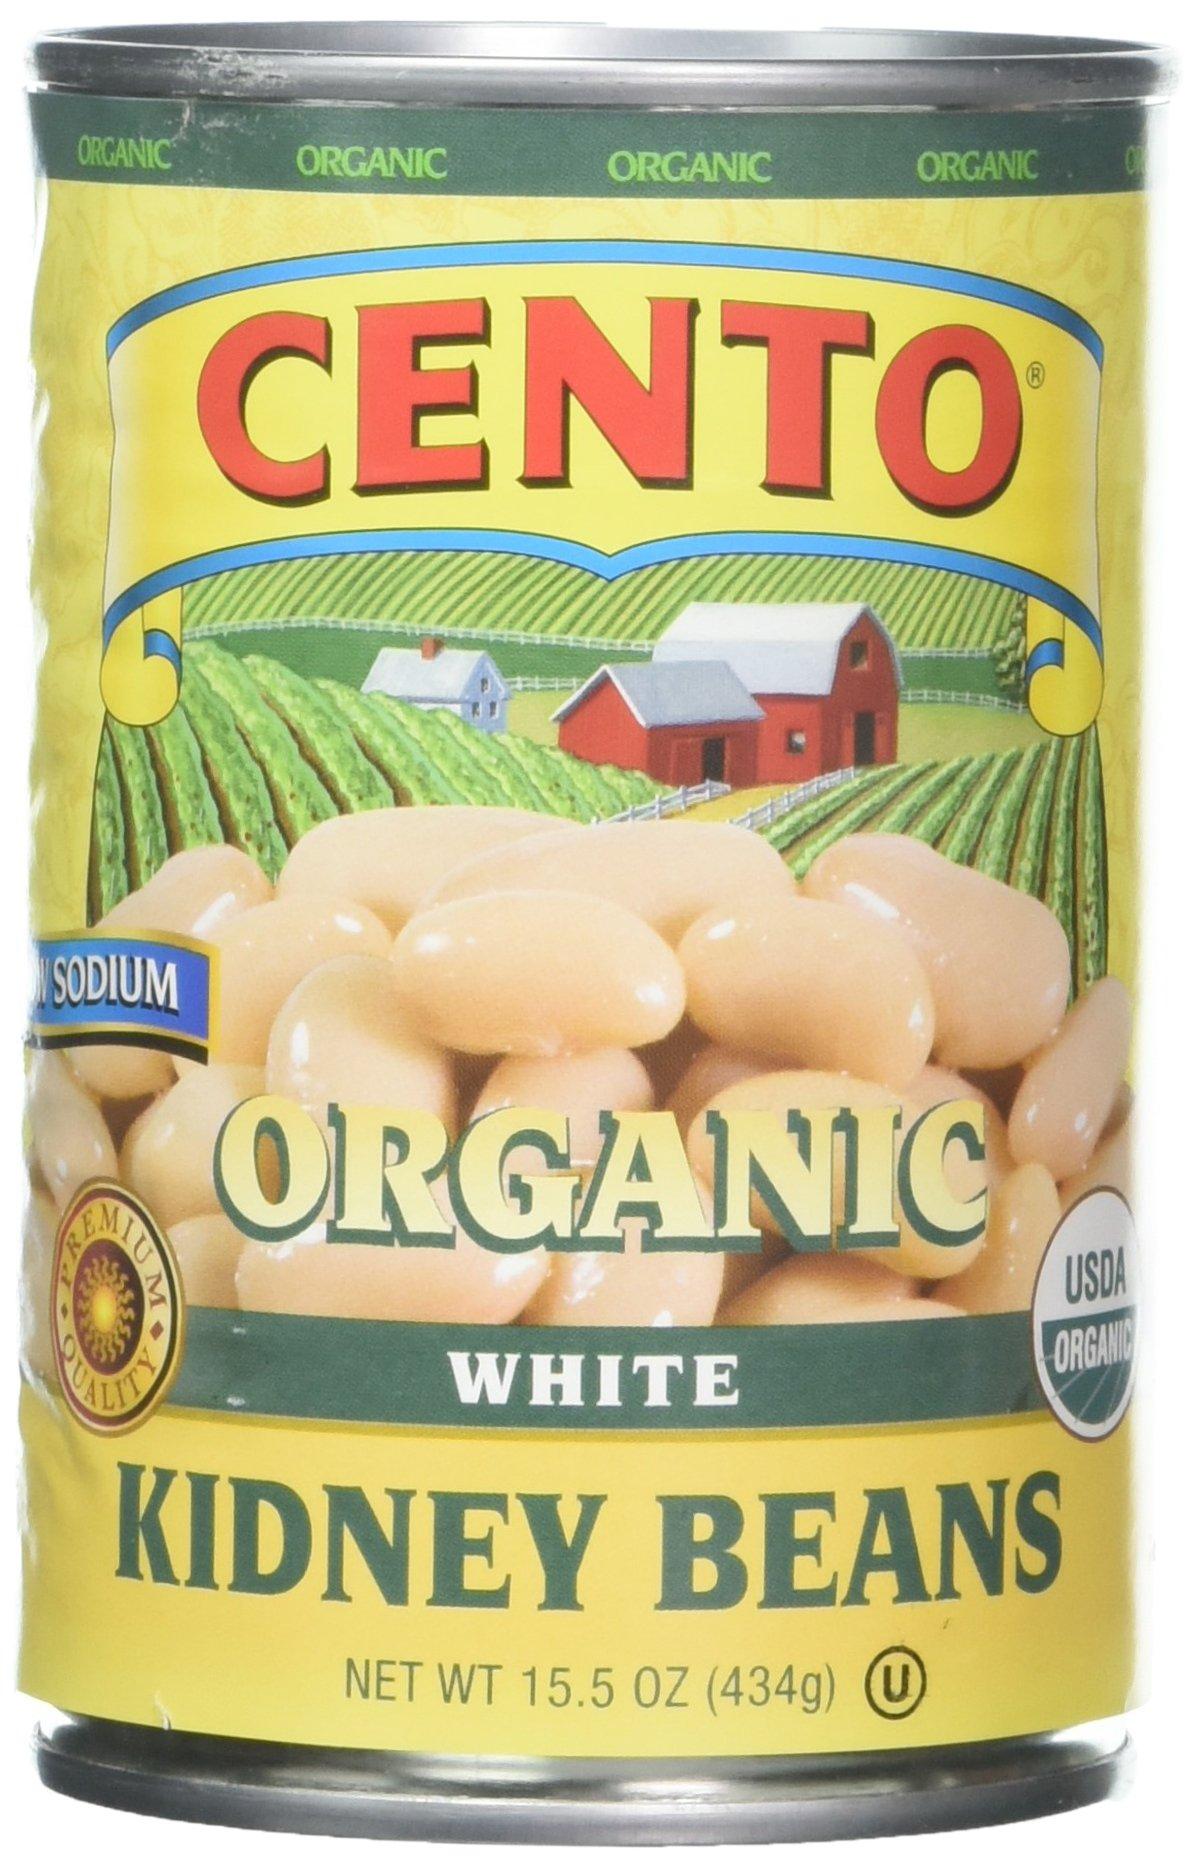 Cento Organic White Kidney Beans, 15.5 Ounce (Pack of 12)